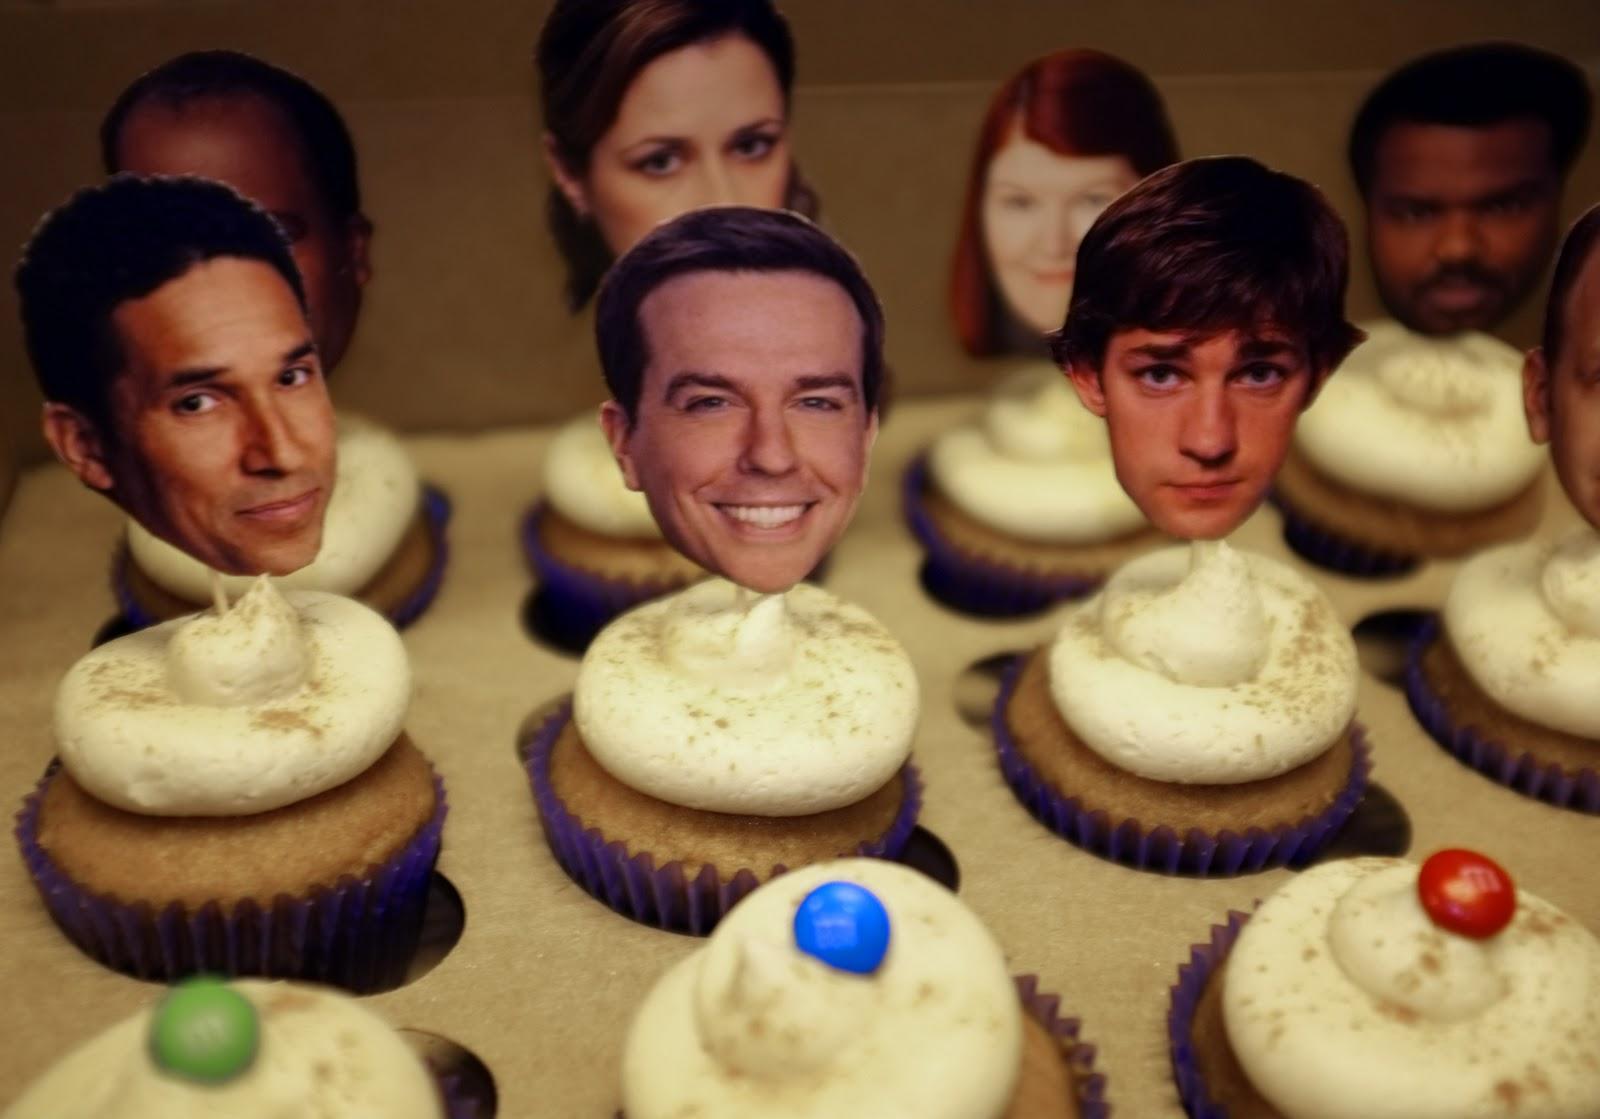 Sweet Elites Vegan Cupcakes The Office Cupcakes